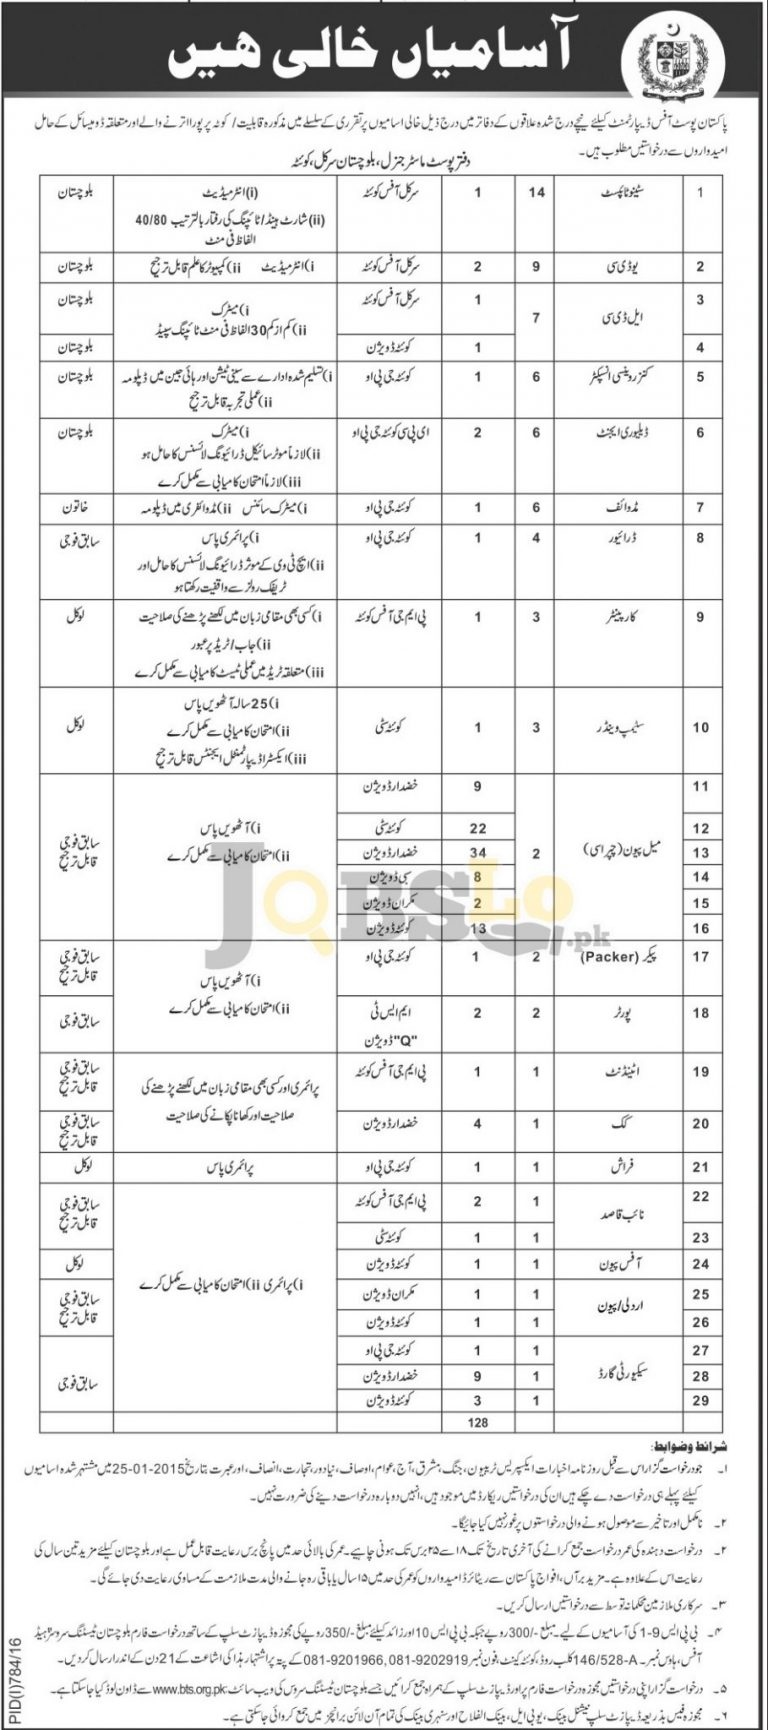 Post Office Jobs 2016 Balochistan Download Application Form www.bts.org.pk